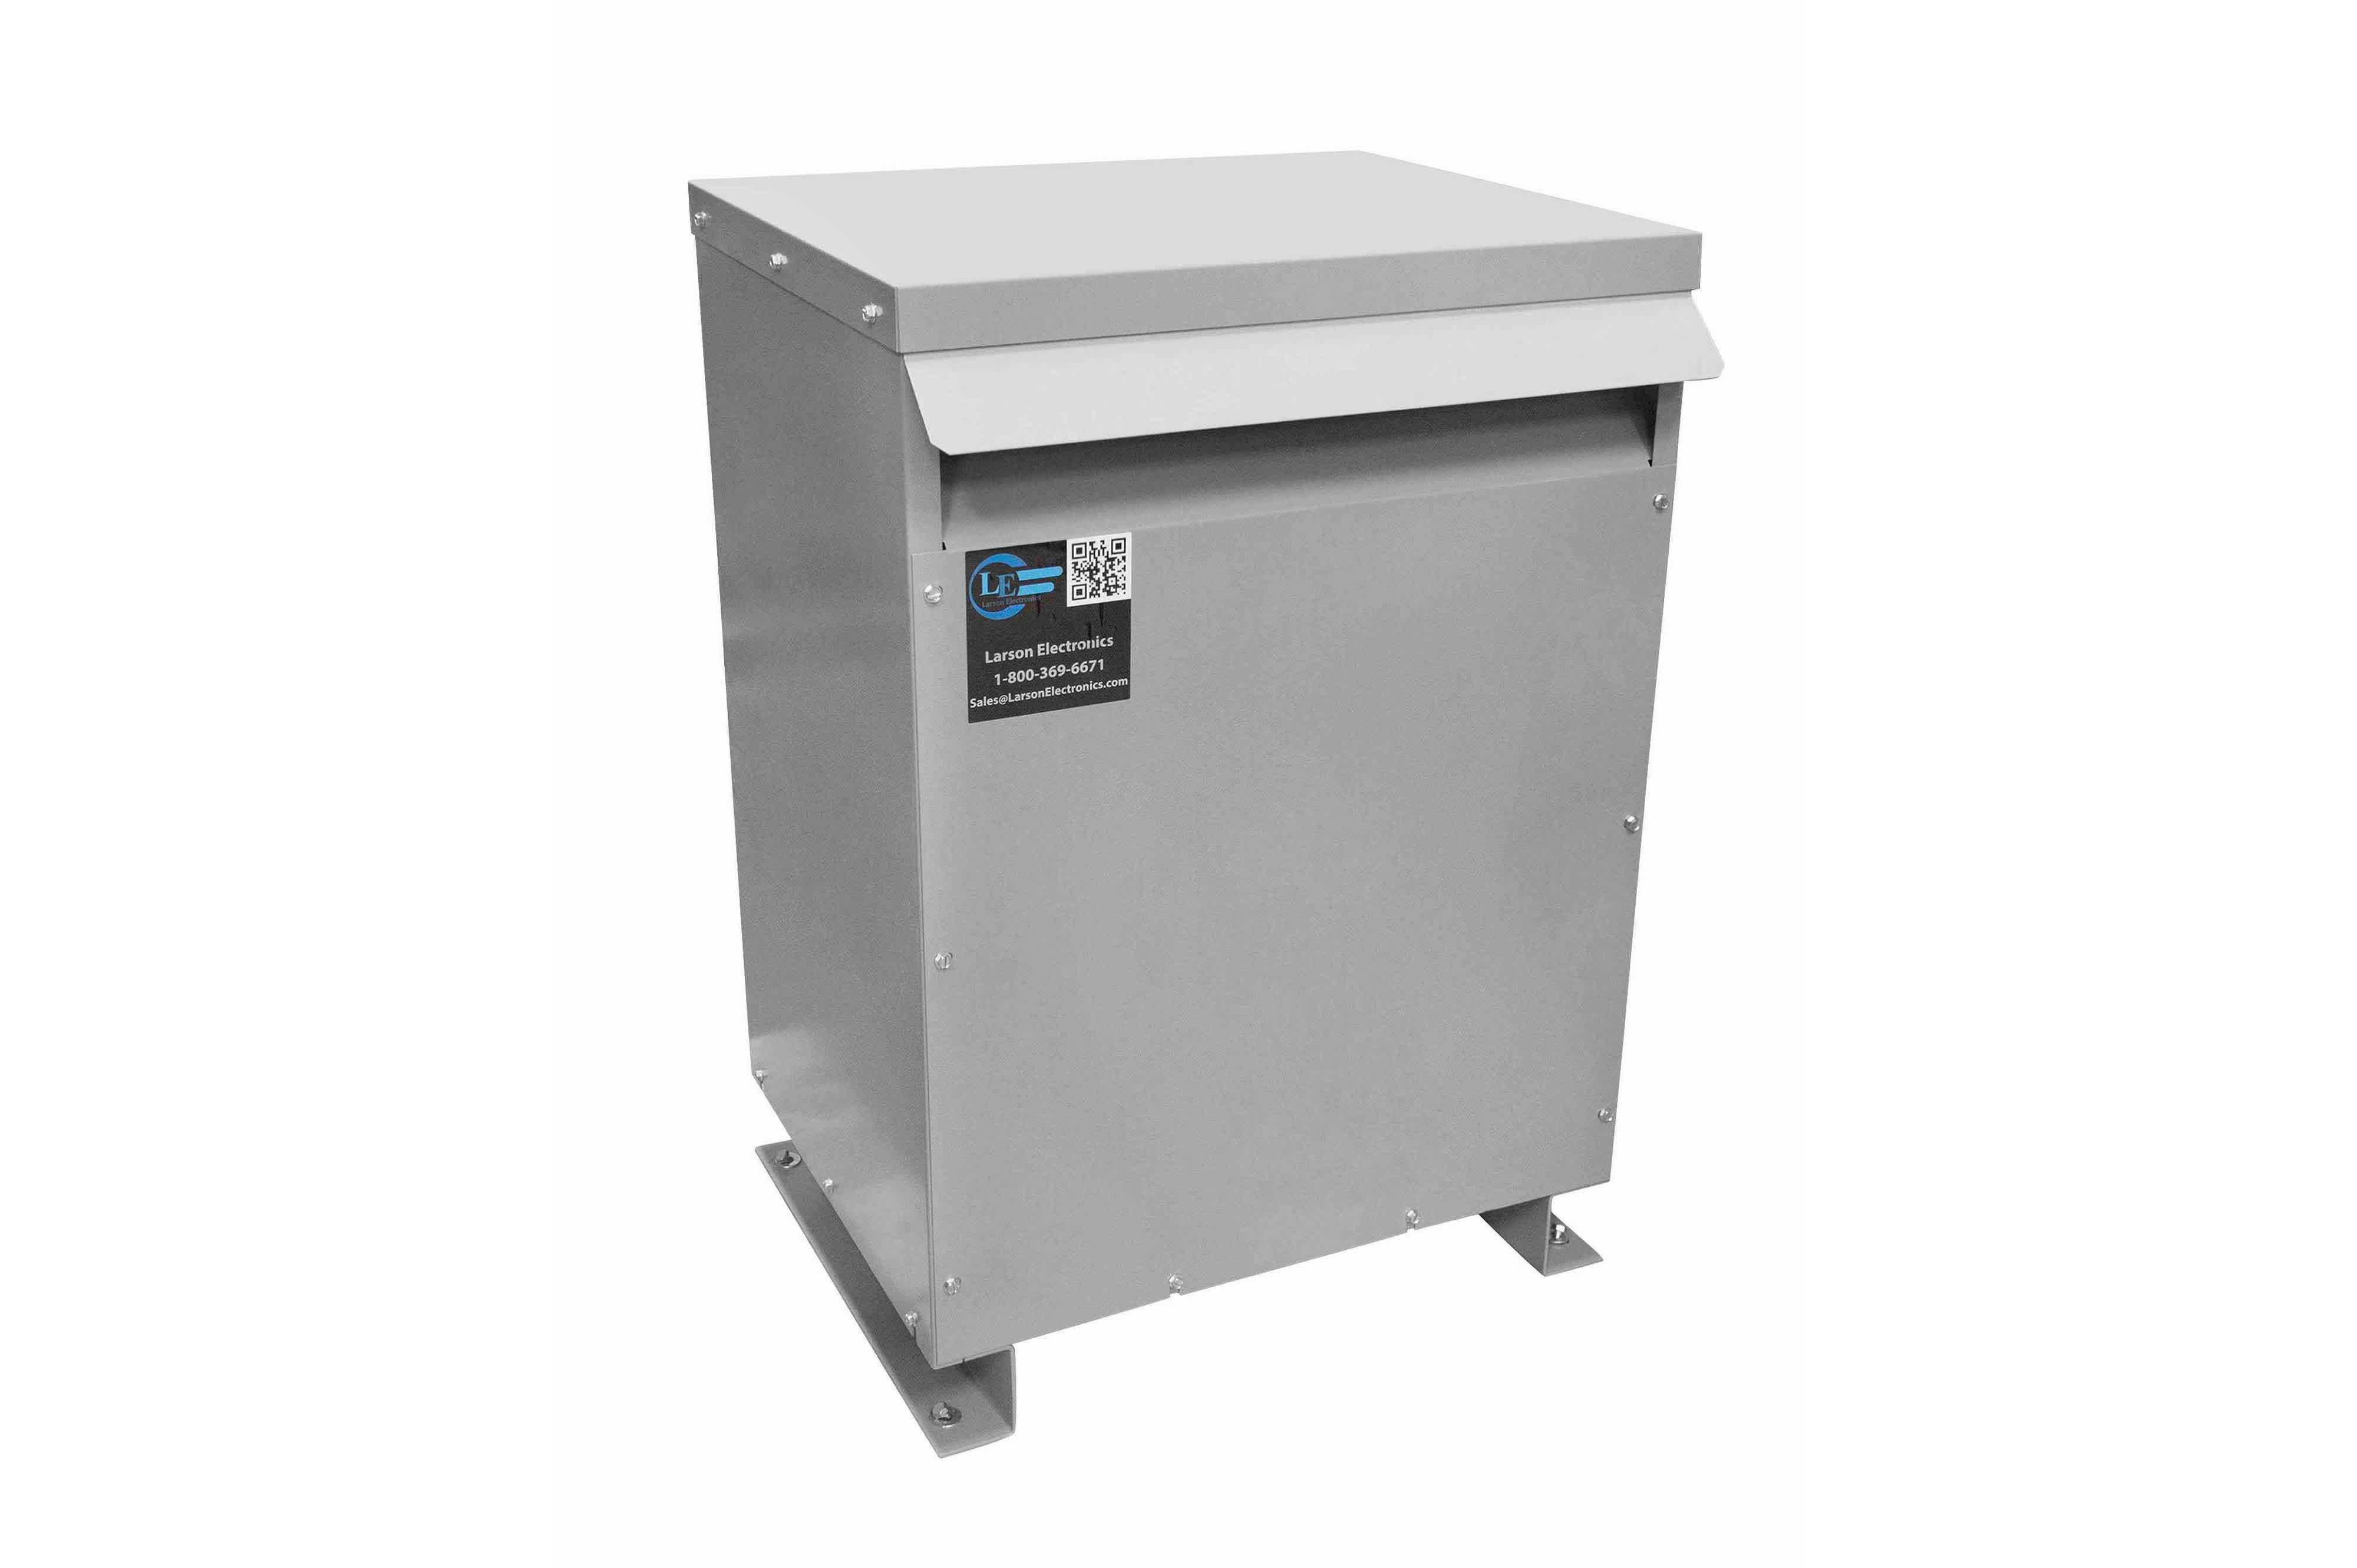 1000 kVA 3PH Isolation Transformer, 460V Wye Primary, 400V Delta Secondary, N3R, Ventilated, 60 Hz